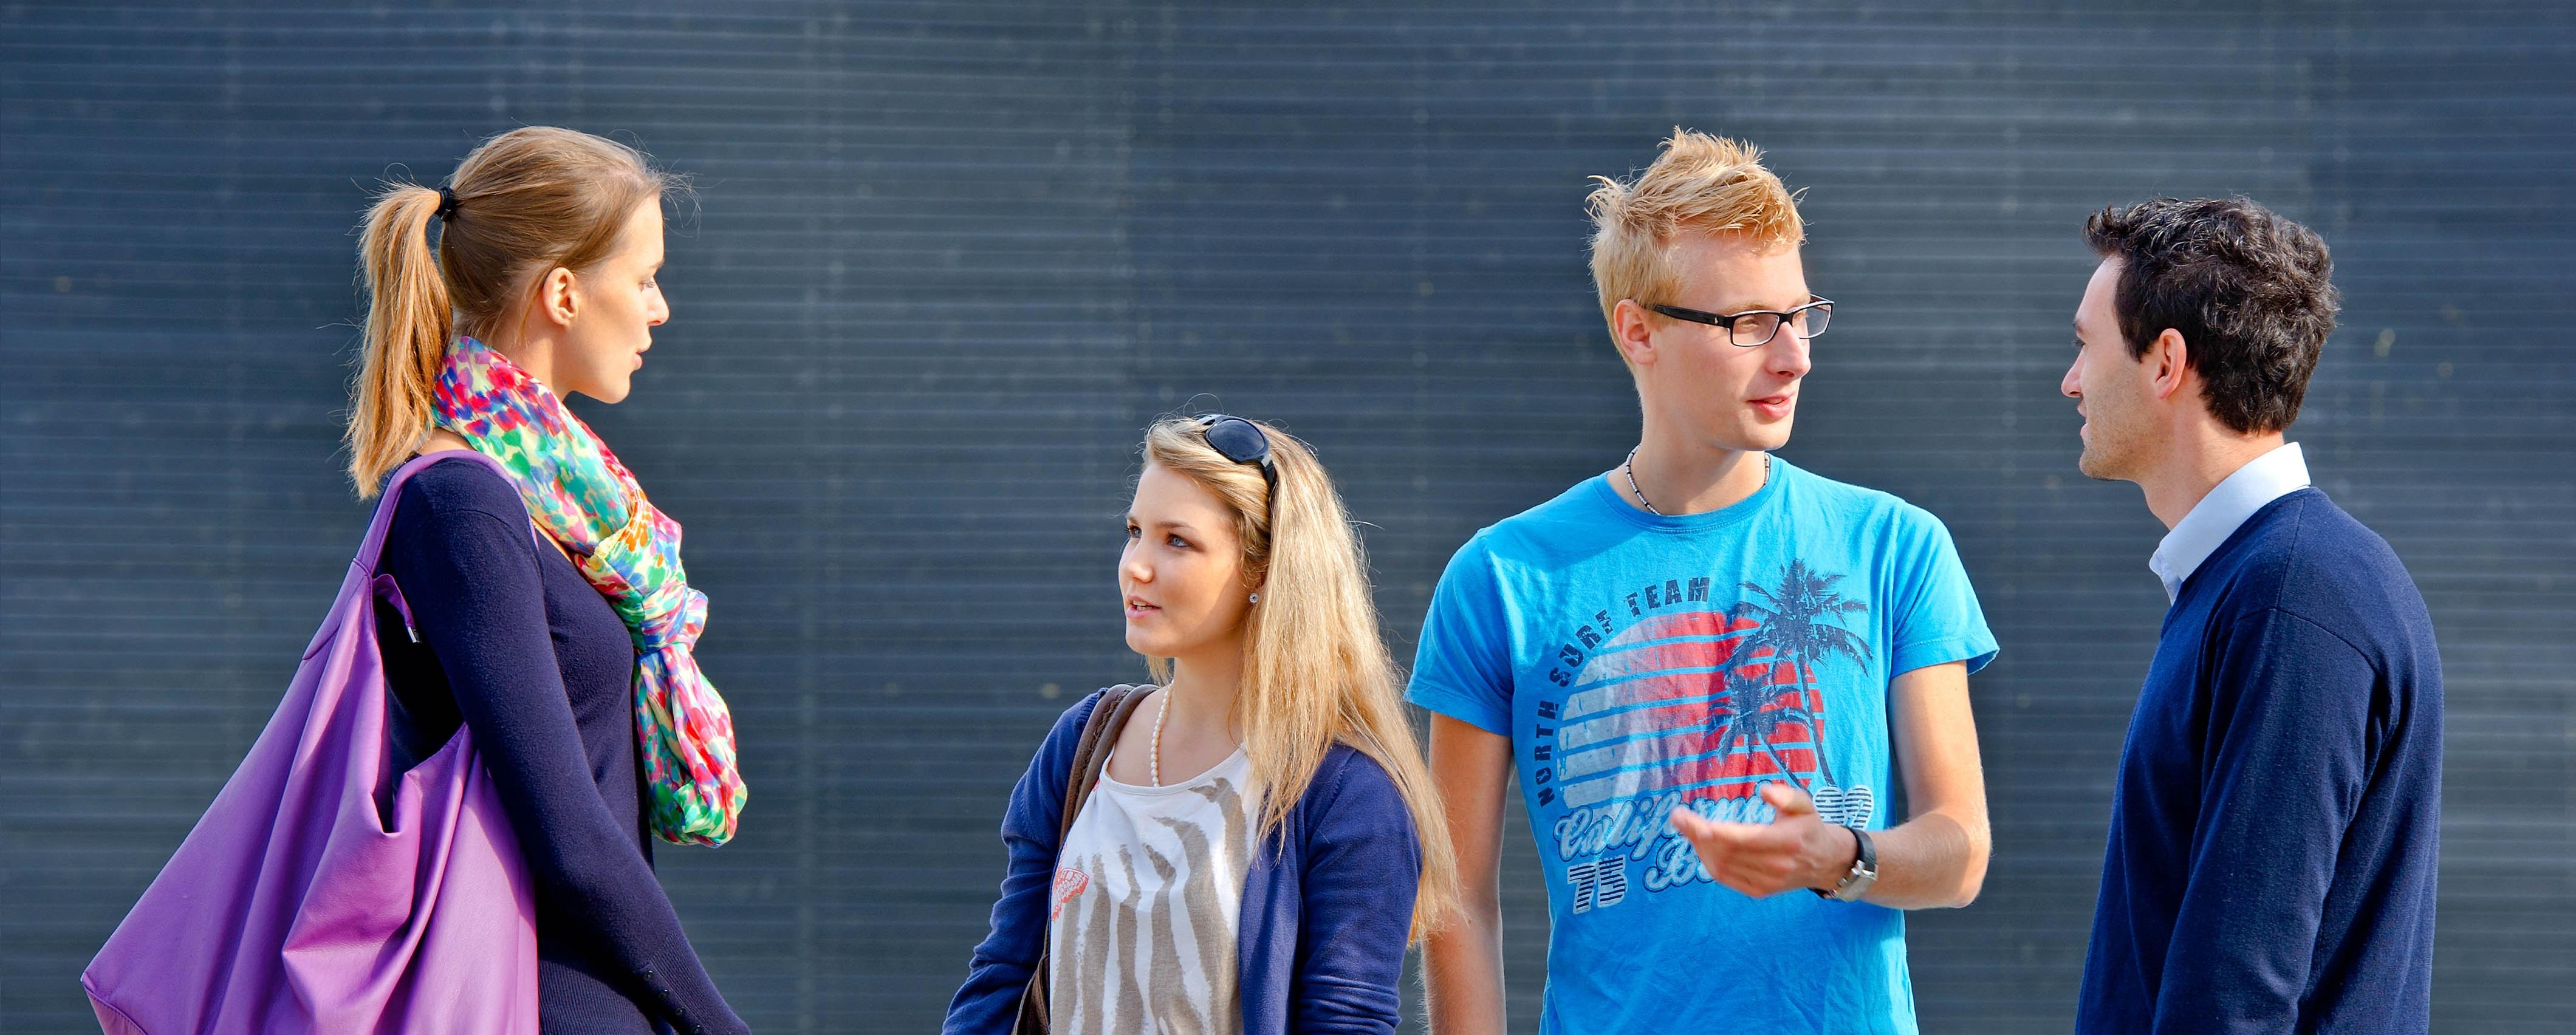 Students at university campus (Image: Andreas Heddergott/ TUM)